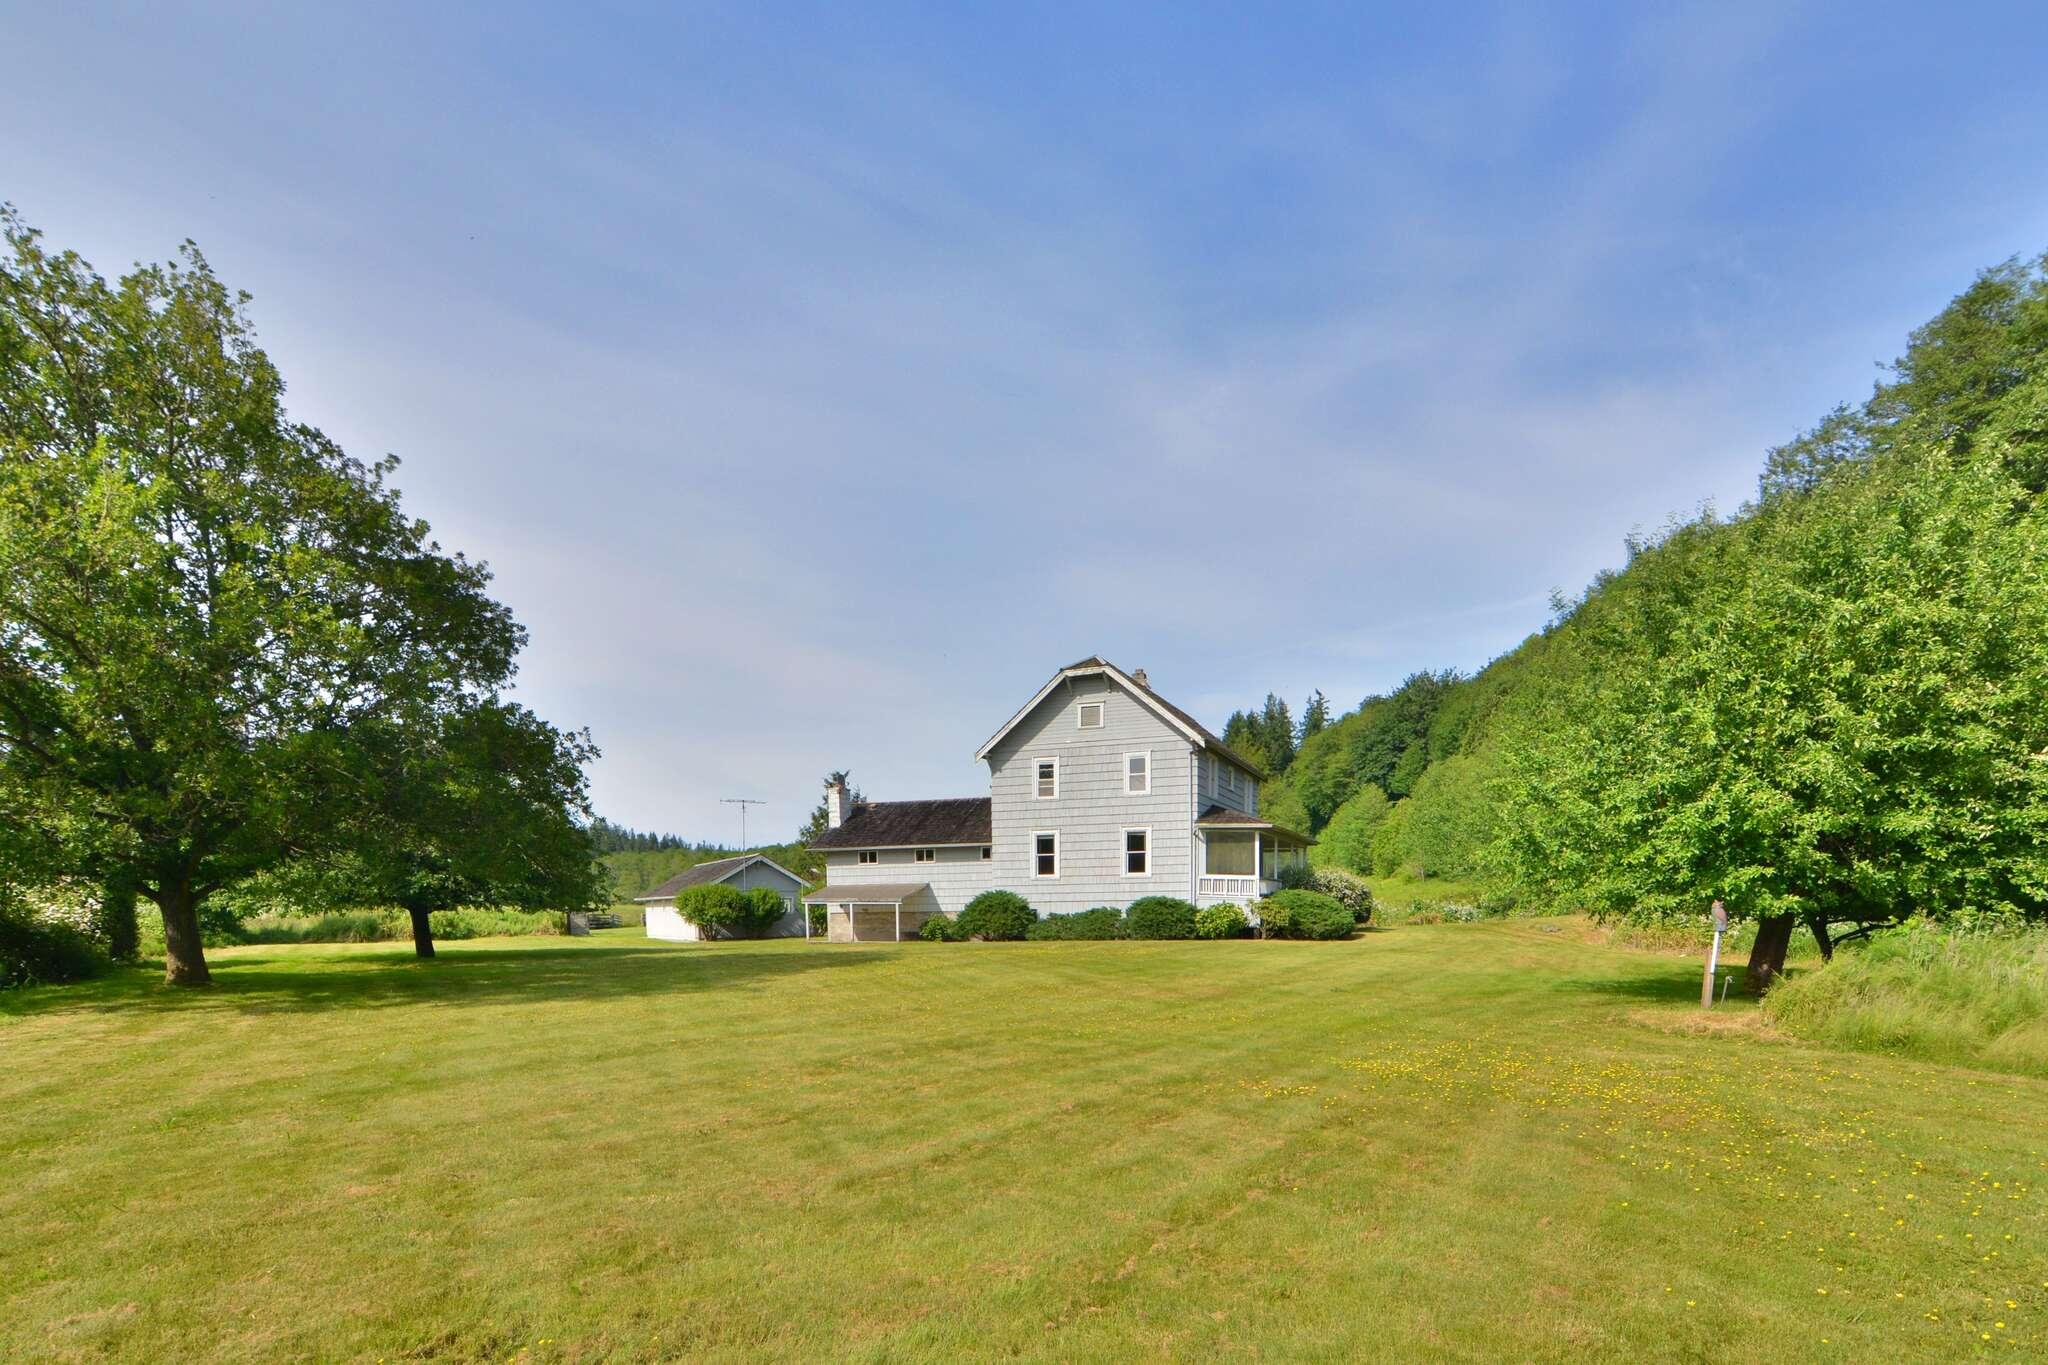 Single Family for Sale at 23139 Big Valley Rd NE Poulsbo, Washington 98370 United States